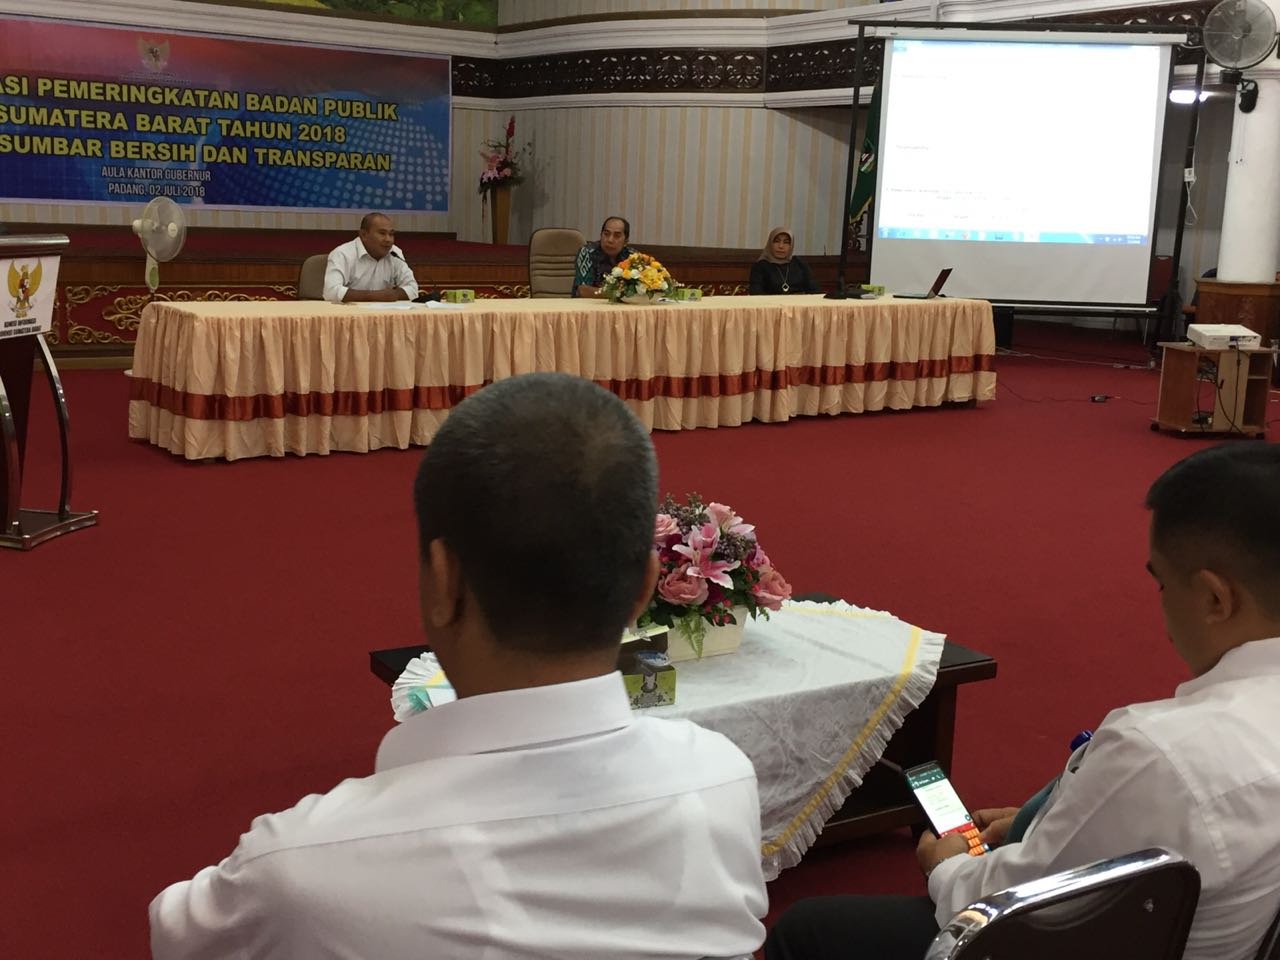 Komisi Informasi Sumatera Barat Cari Badan Publik Paling Transparan 2018